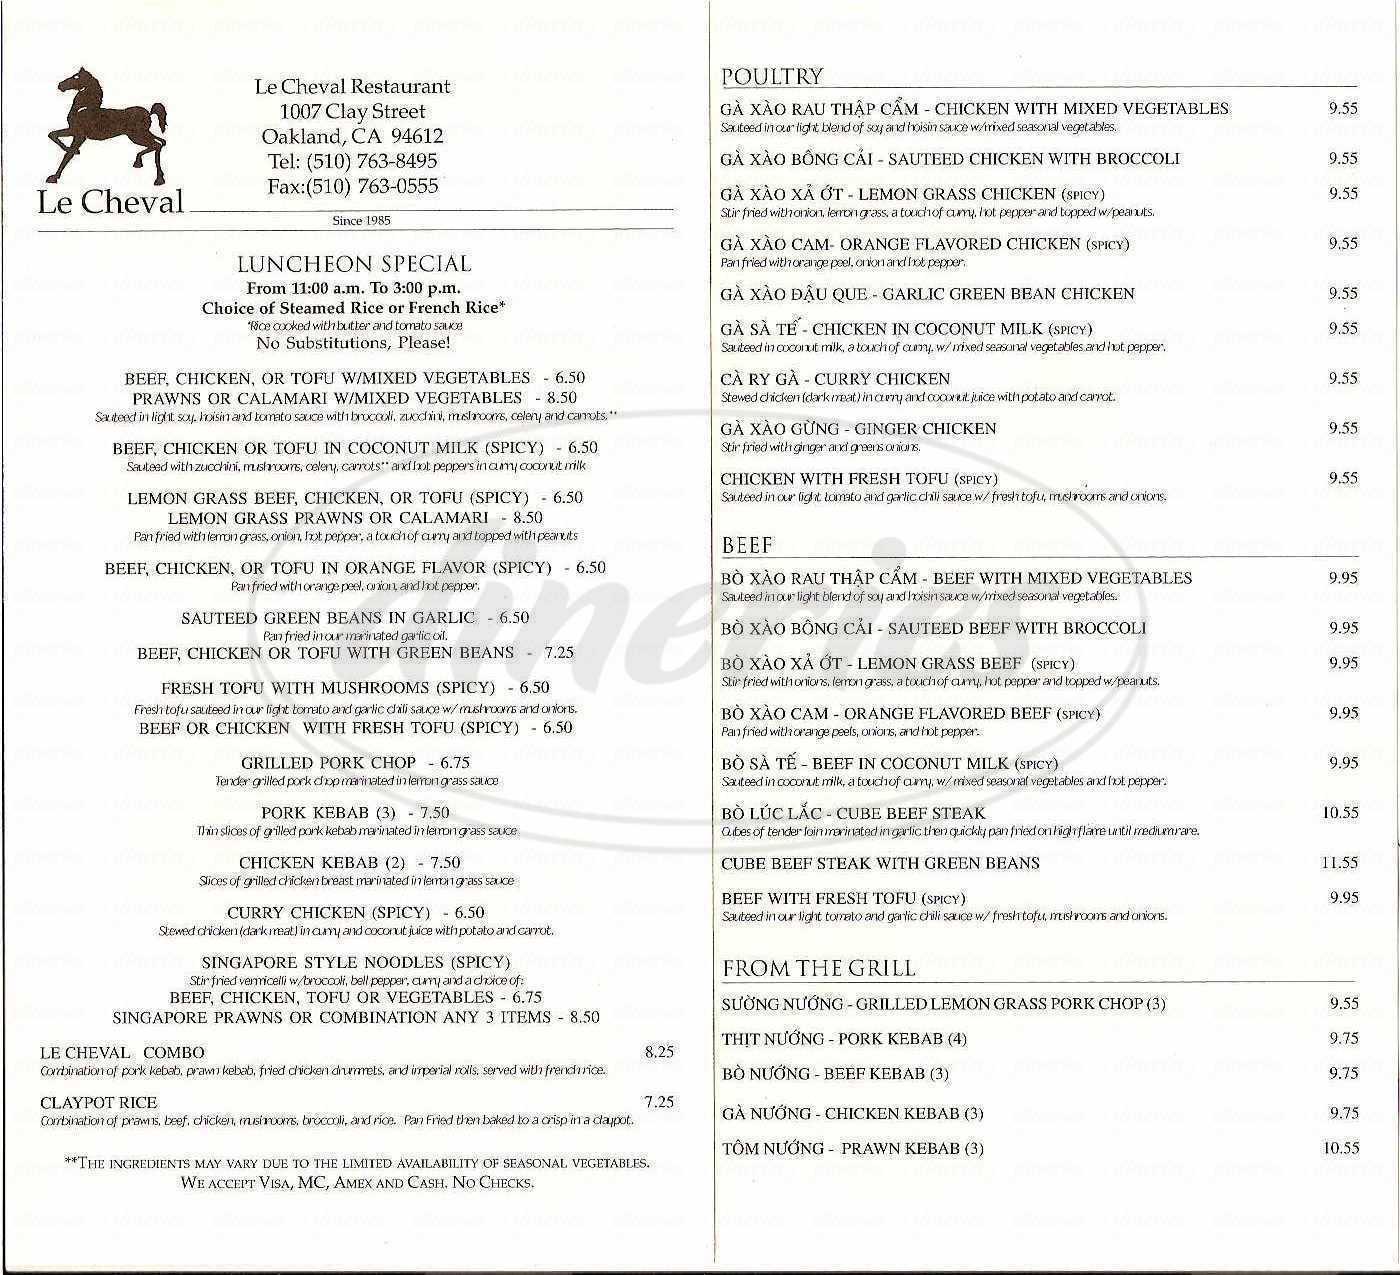 menu for Le Cheval